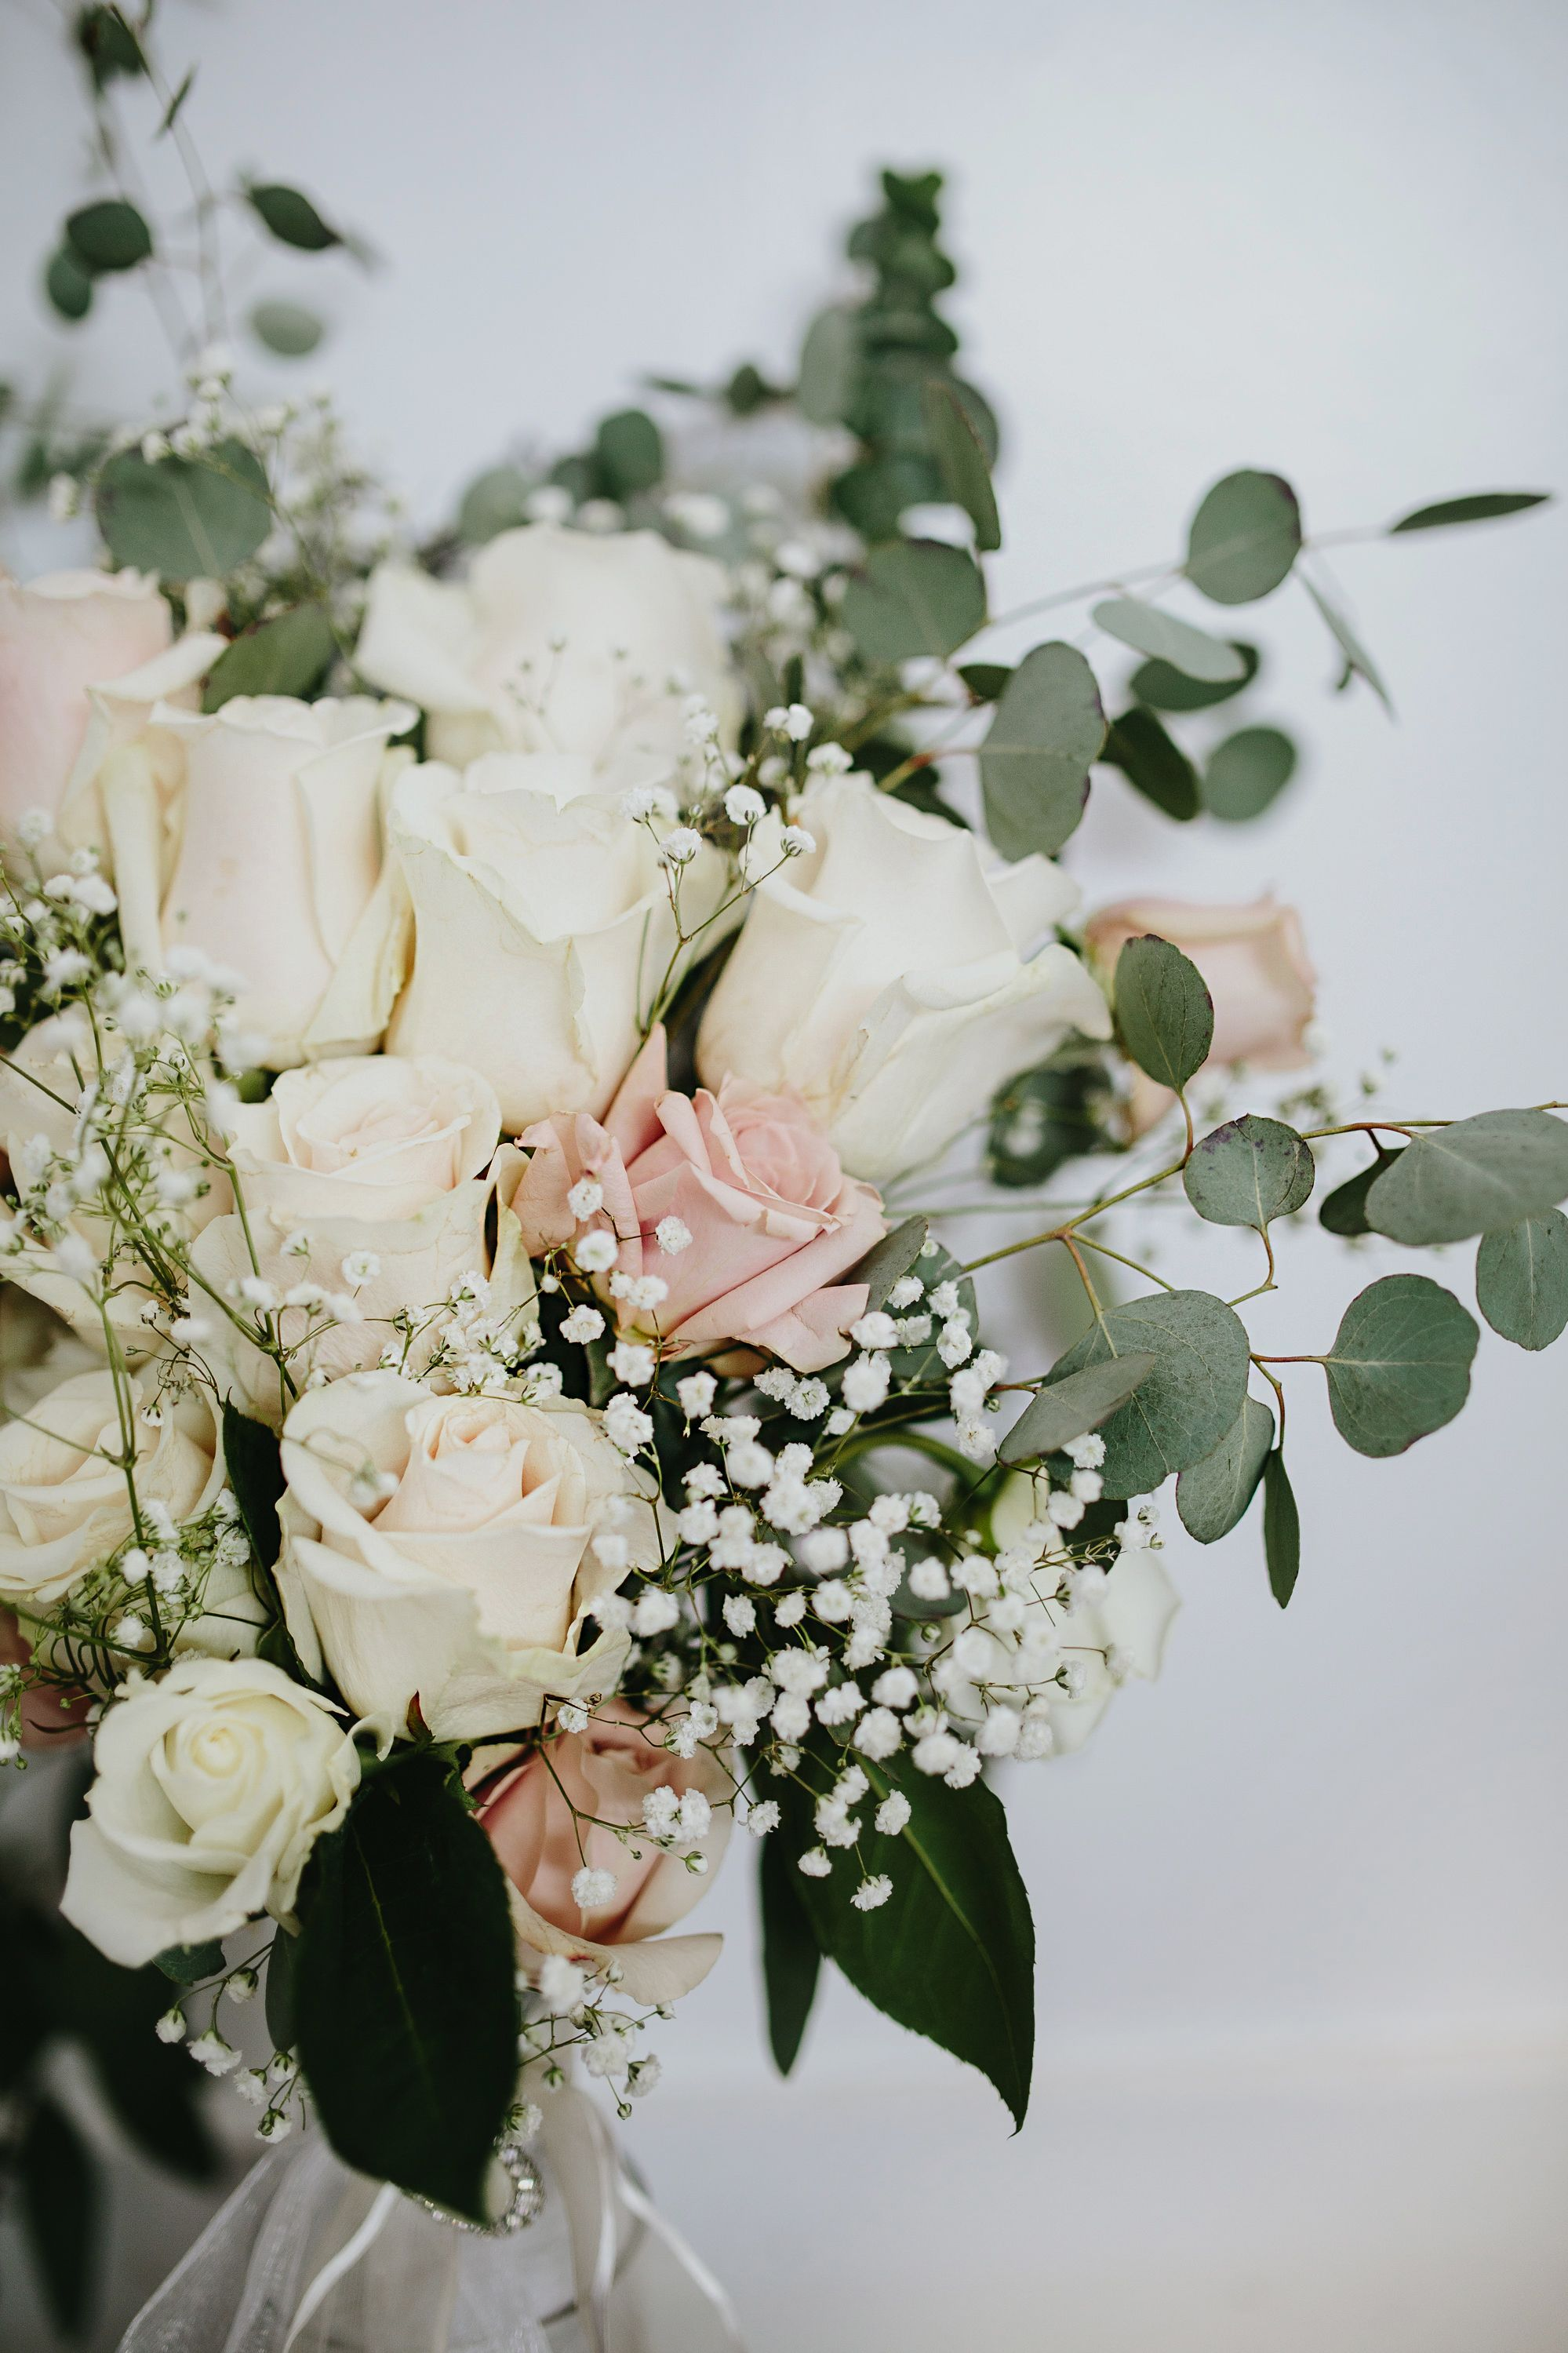 costco wedding bouquets photo - 1